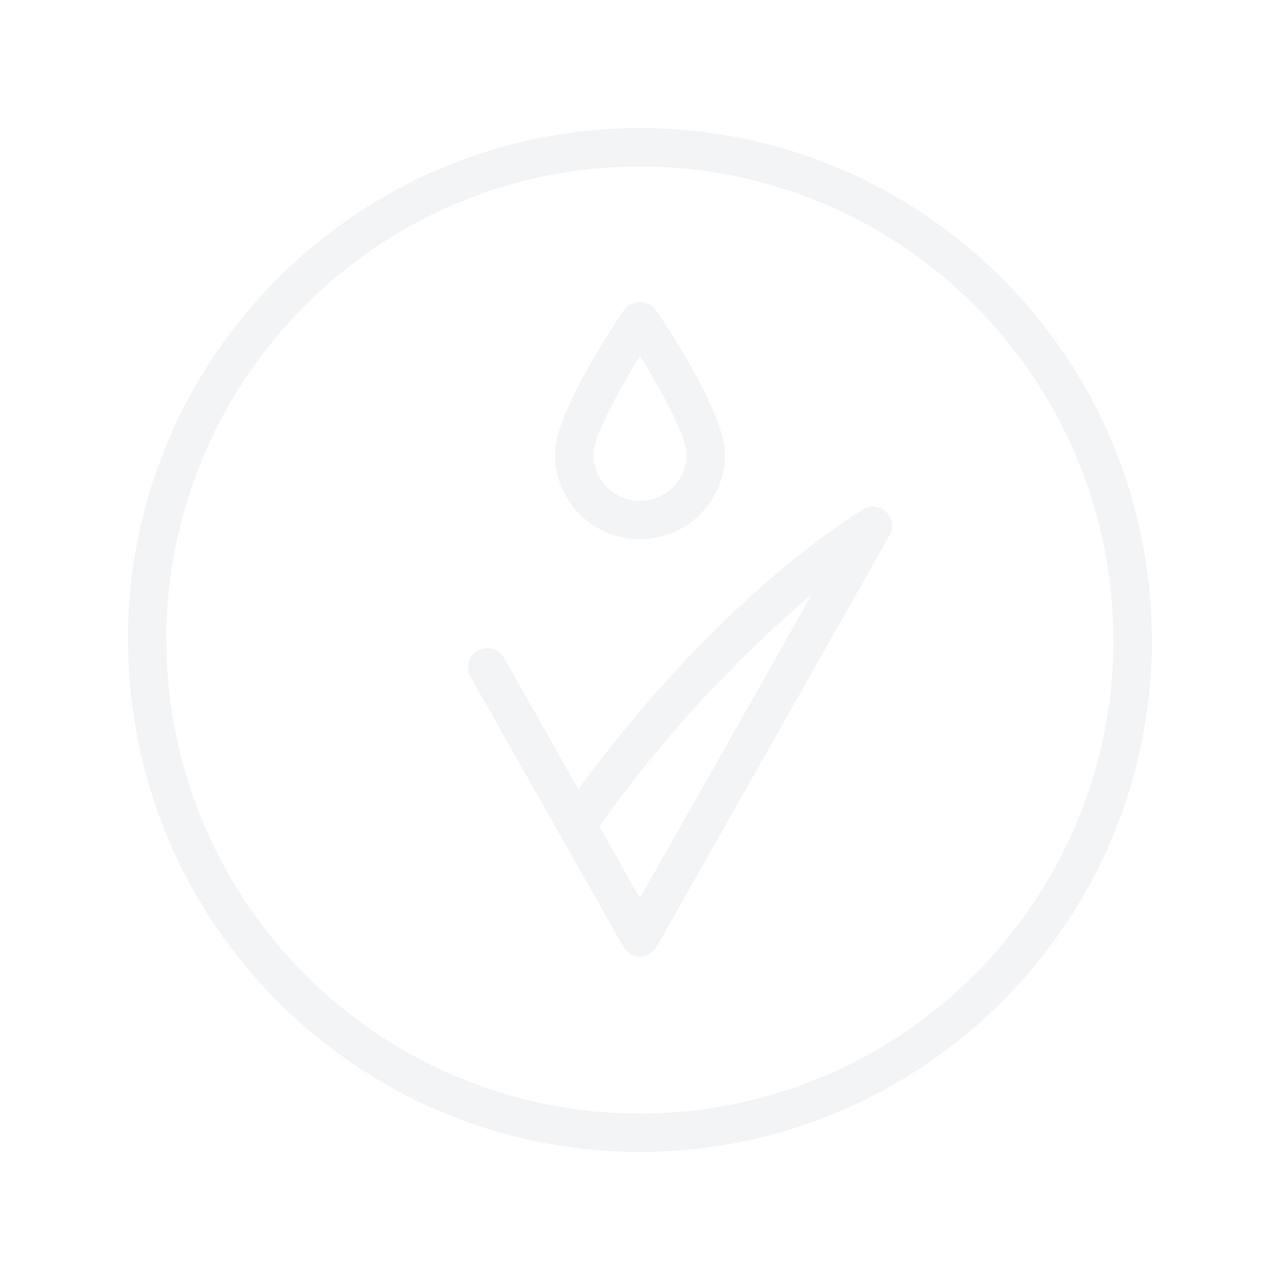 DECLEOR Hydra Floral White Petal Sleeping Mask 50ml